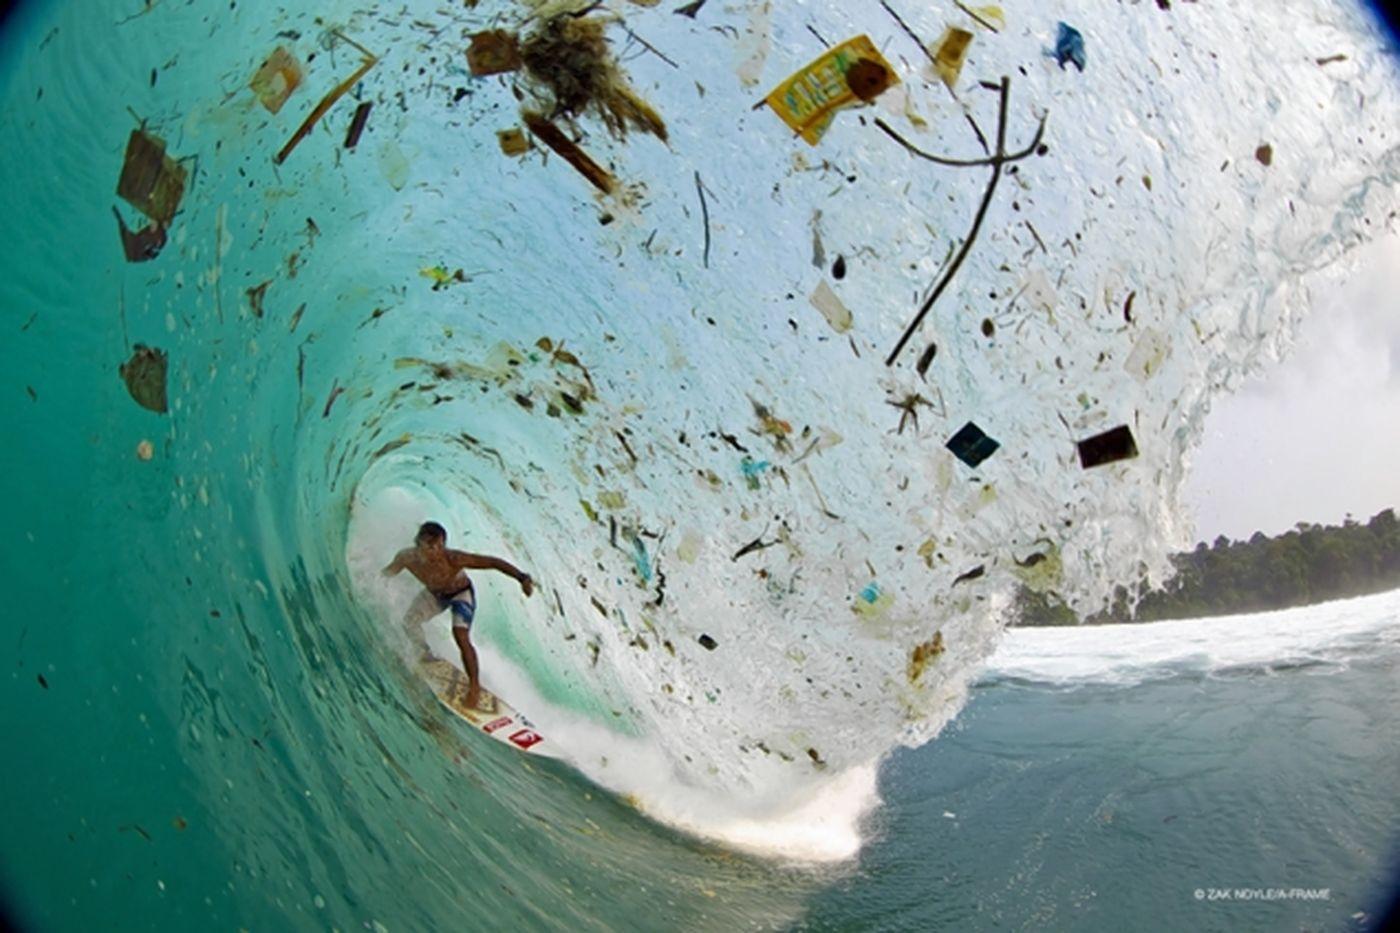 plastic-pollution-surfer-plastic-wave-1400x933.jpg